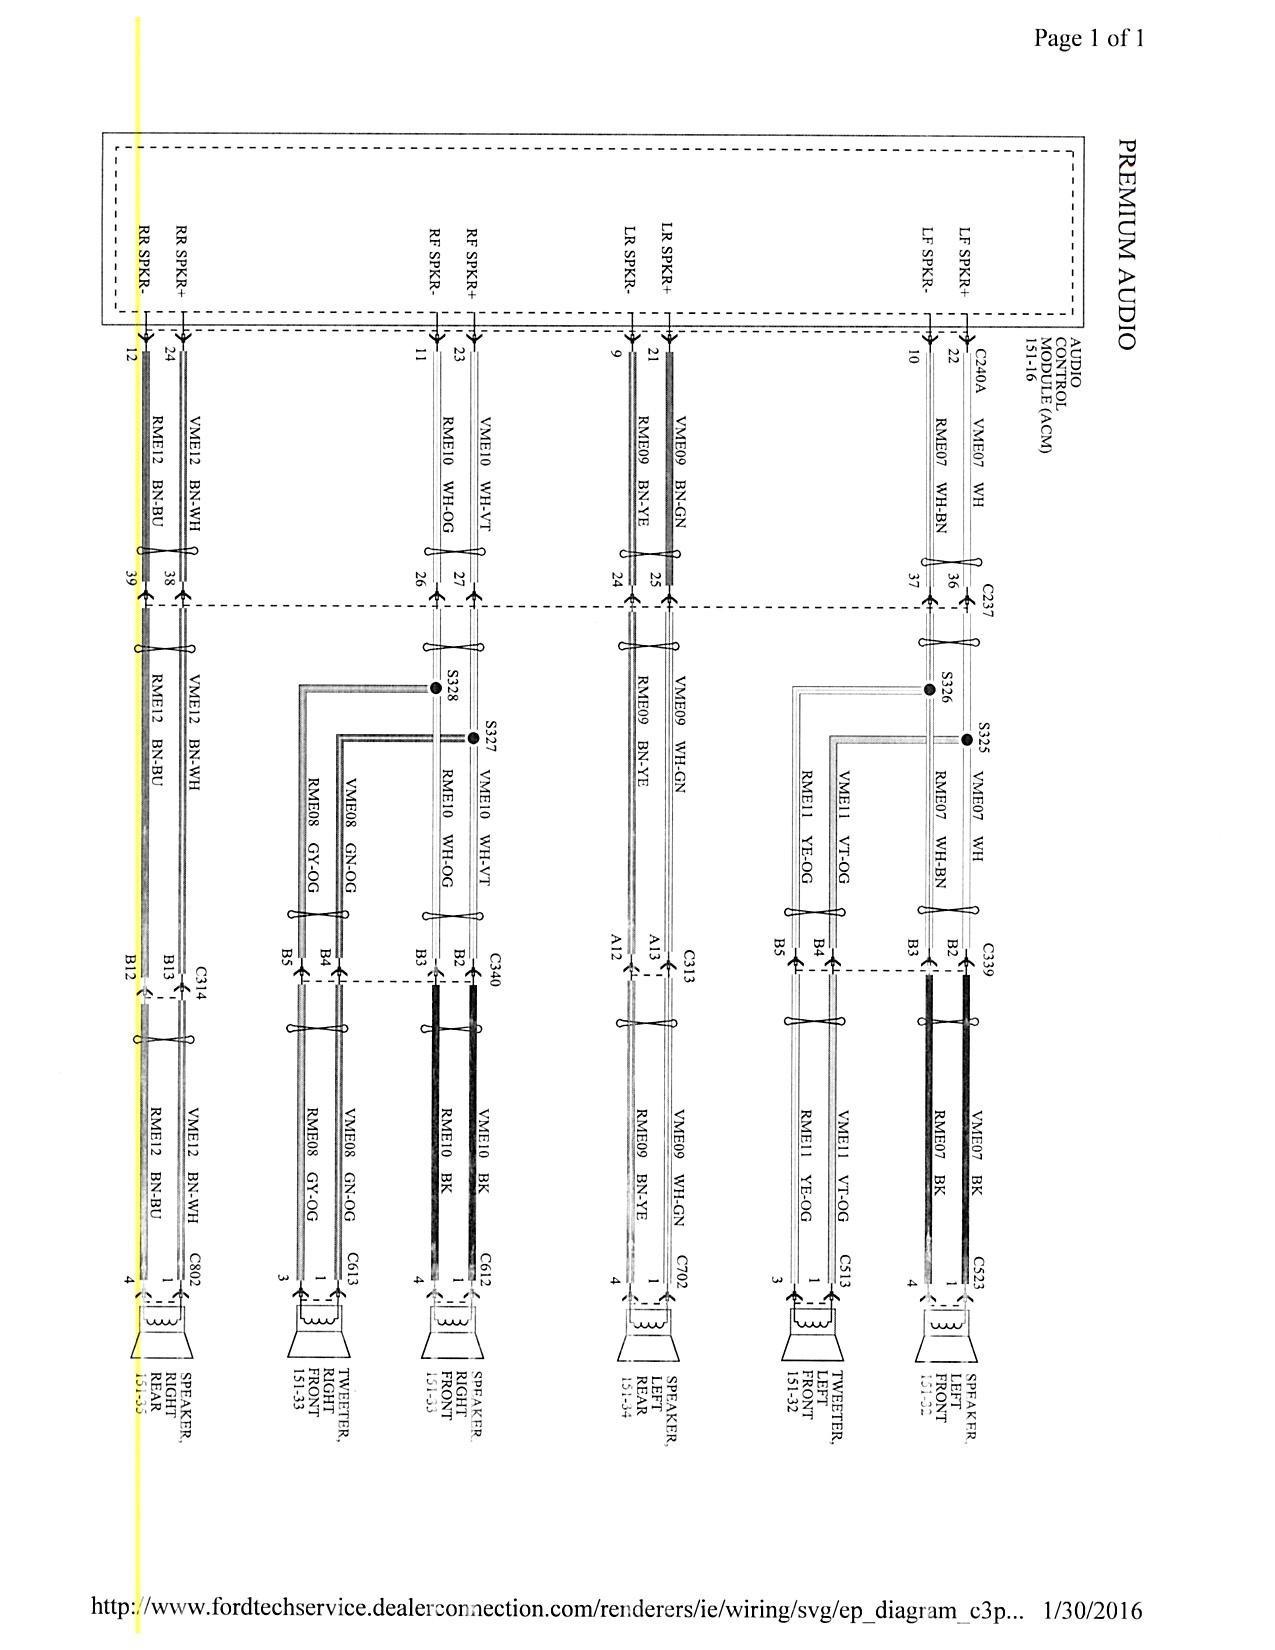 2001 Ford Focus Steering Column Wiring Diagram - Wiring Diagram •